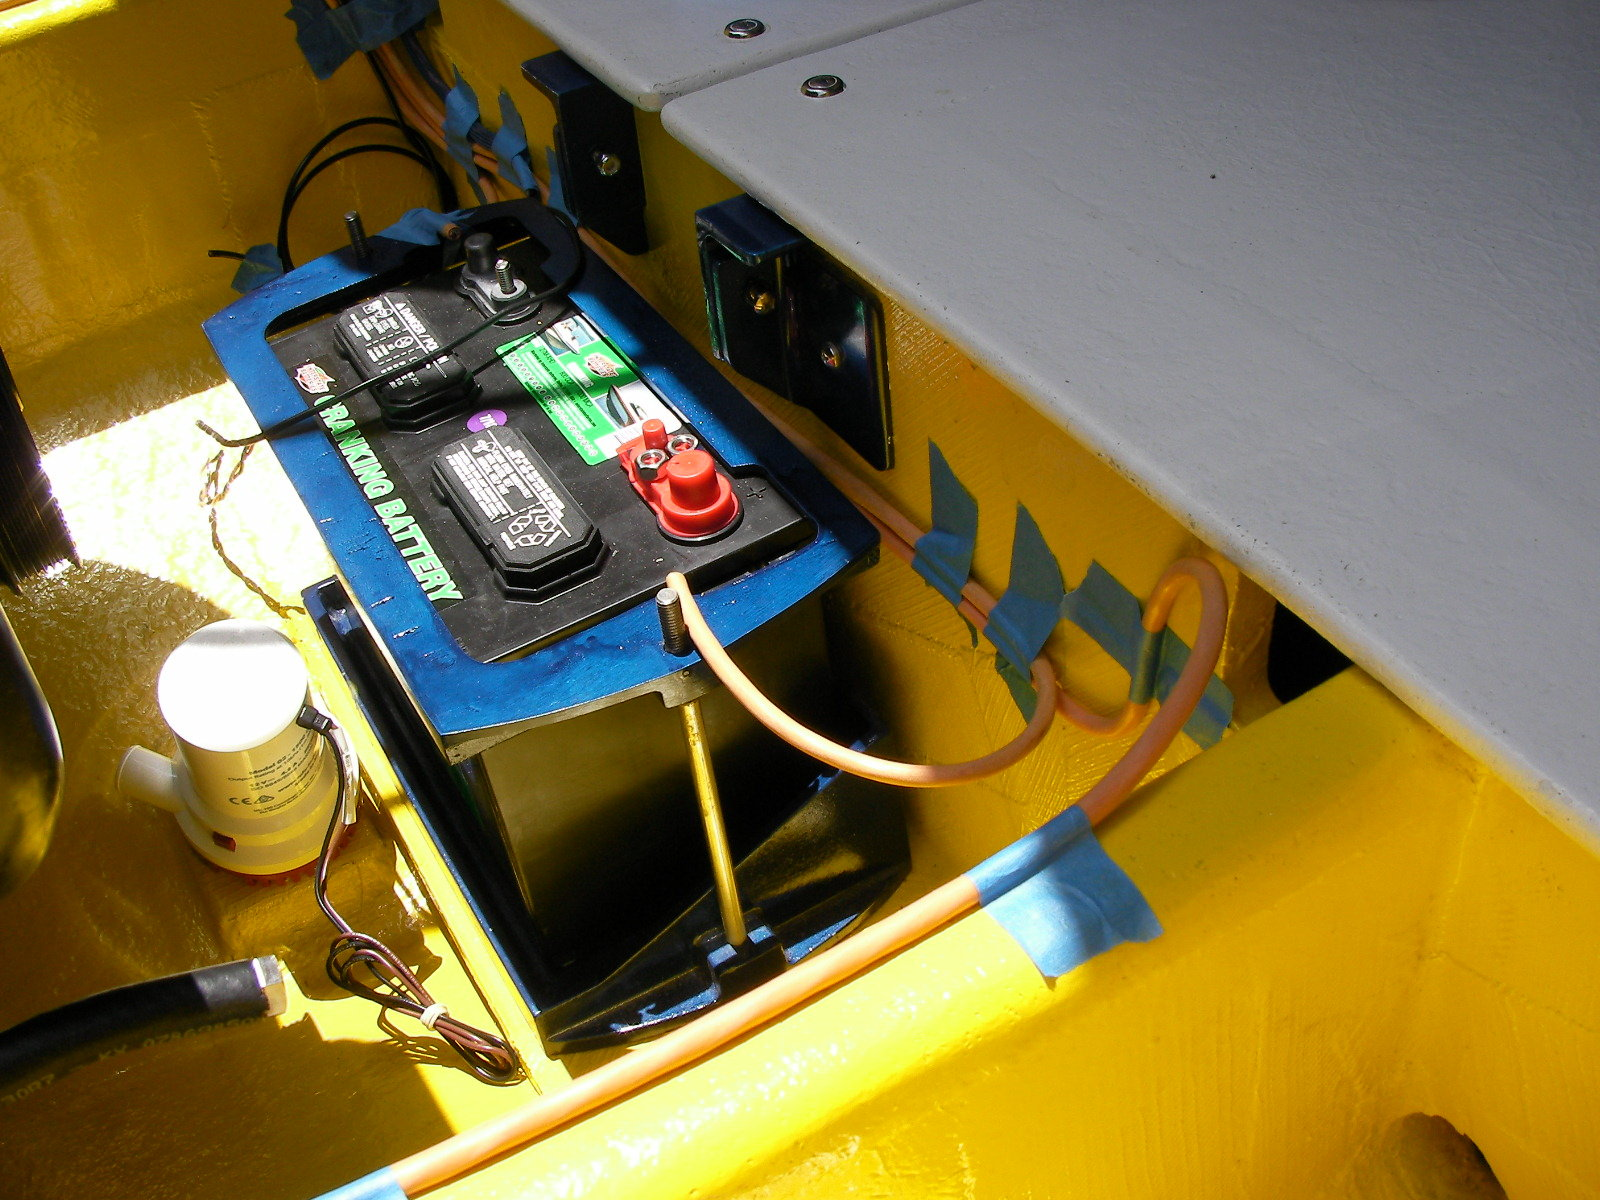 calling the OSO 12 volt braintrust, in 3 parts